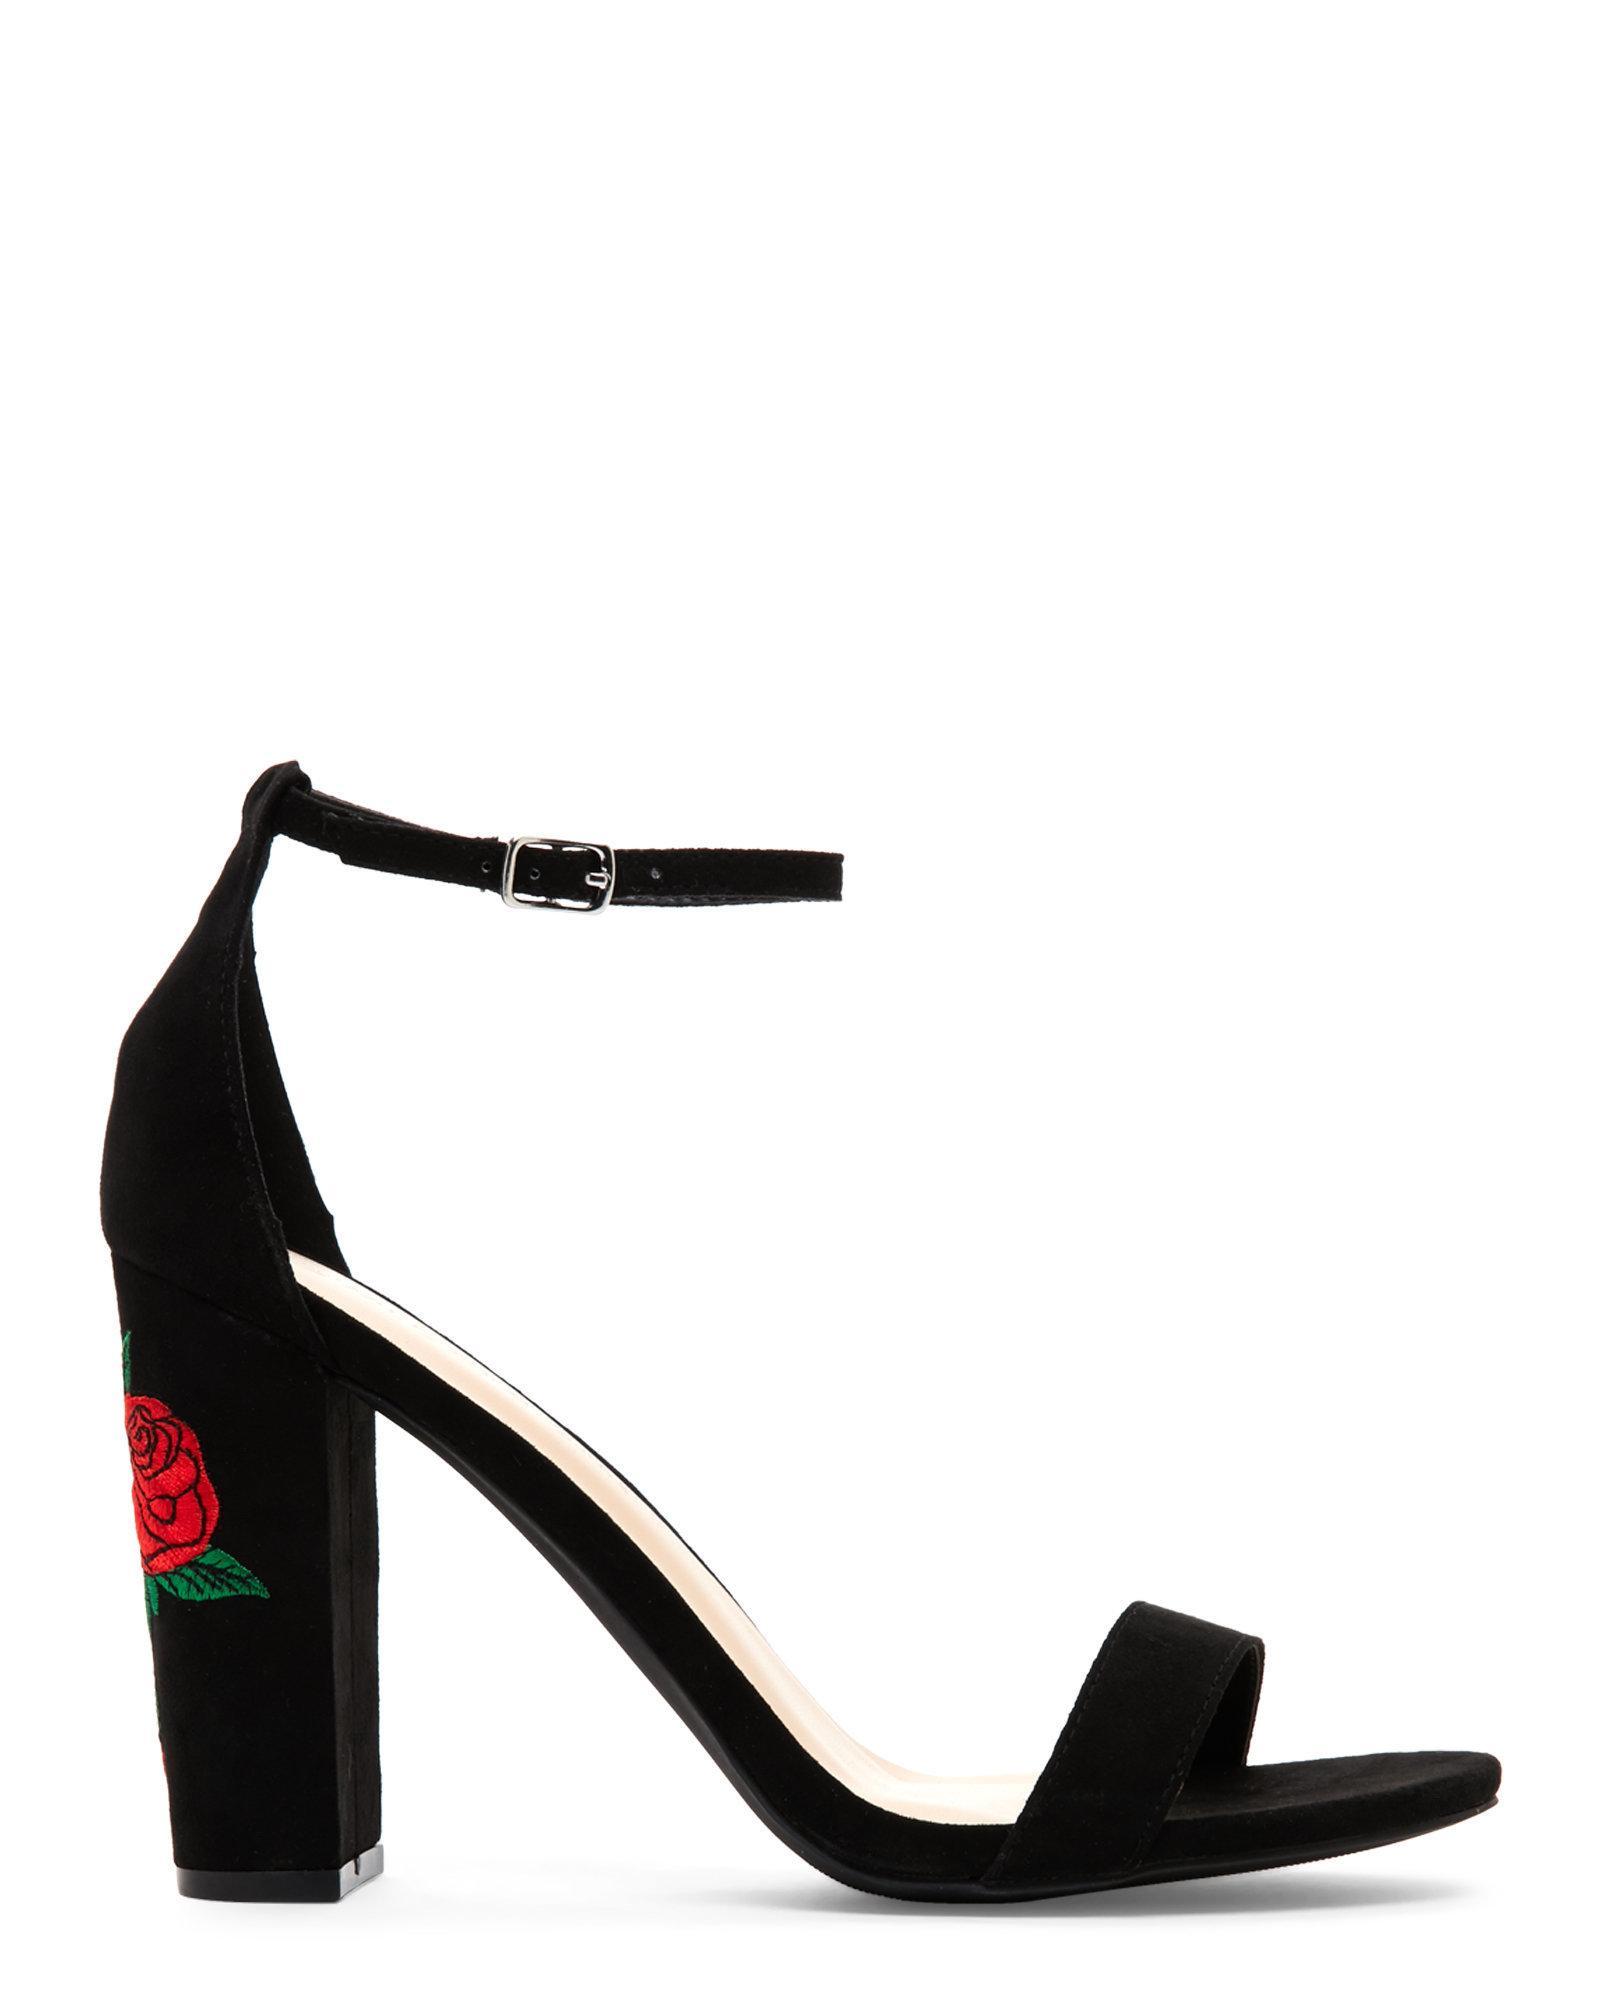 f81e9761b4 Wild Diva Black Morris Embroidered Block Heel Sandals in Black - Lyst